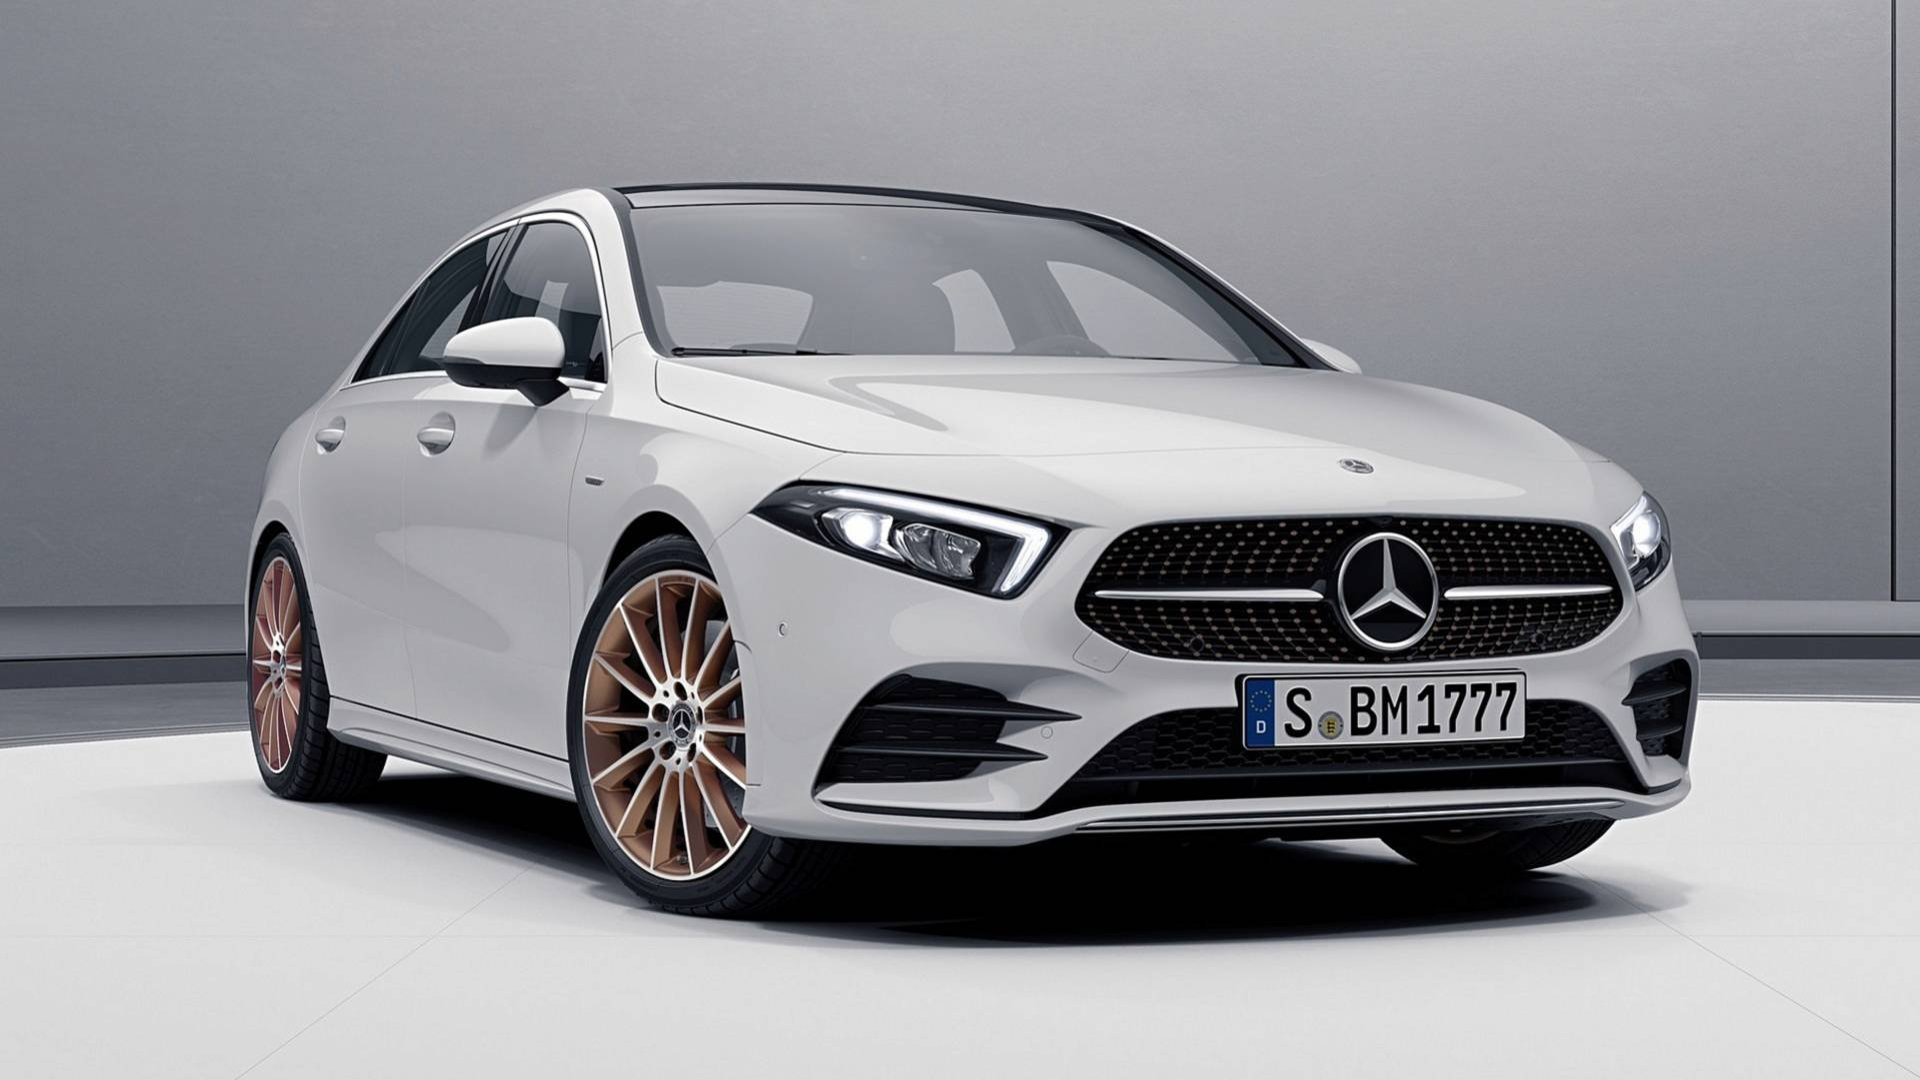 2019 Mercedes A Class Sedan Edition 1 Shows Off Copper Accents